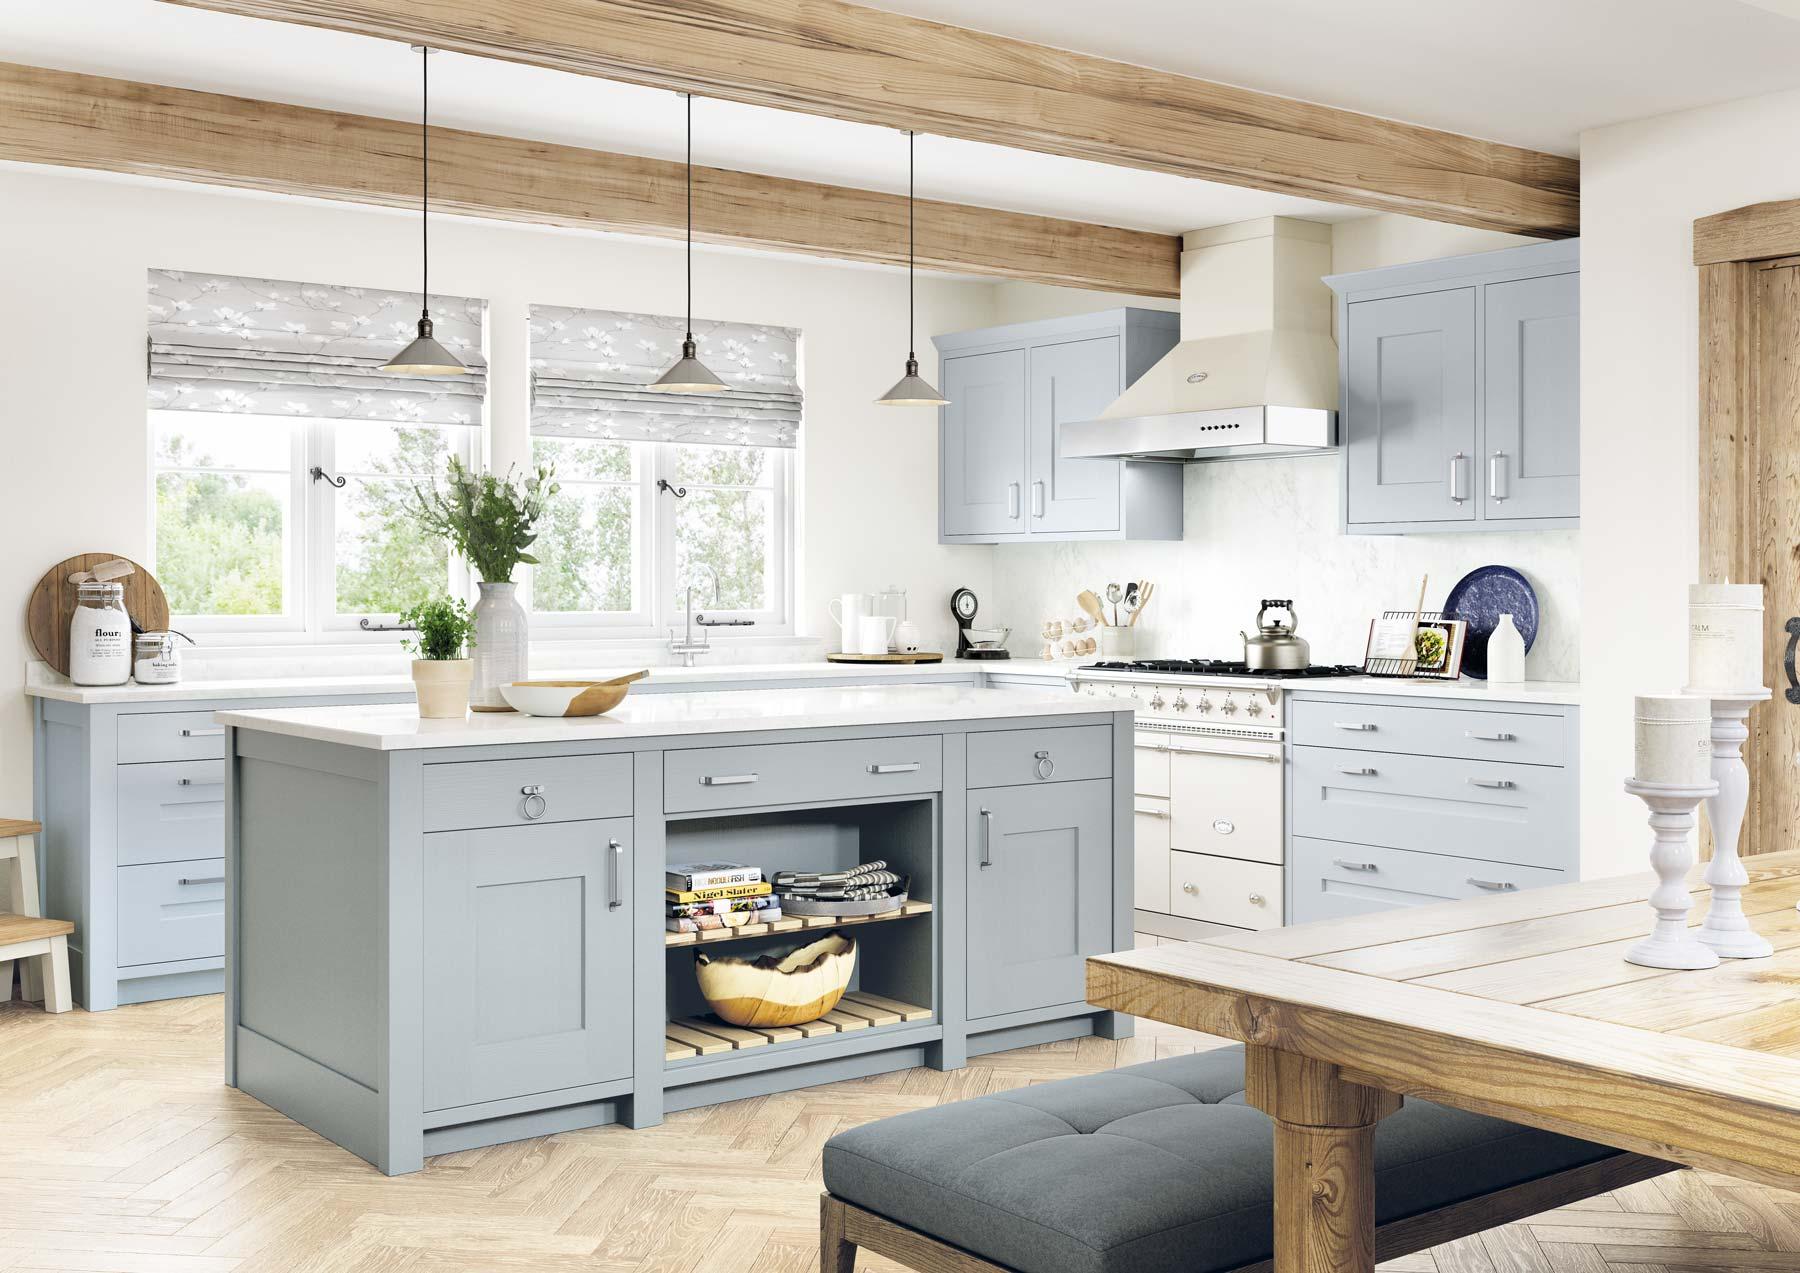 In-Frame Kitchens in Dublin, Ireland